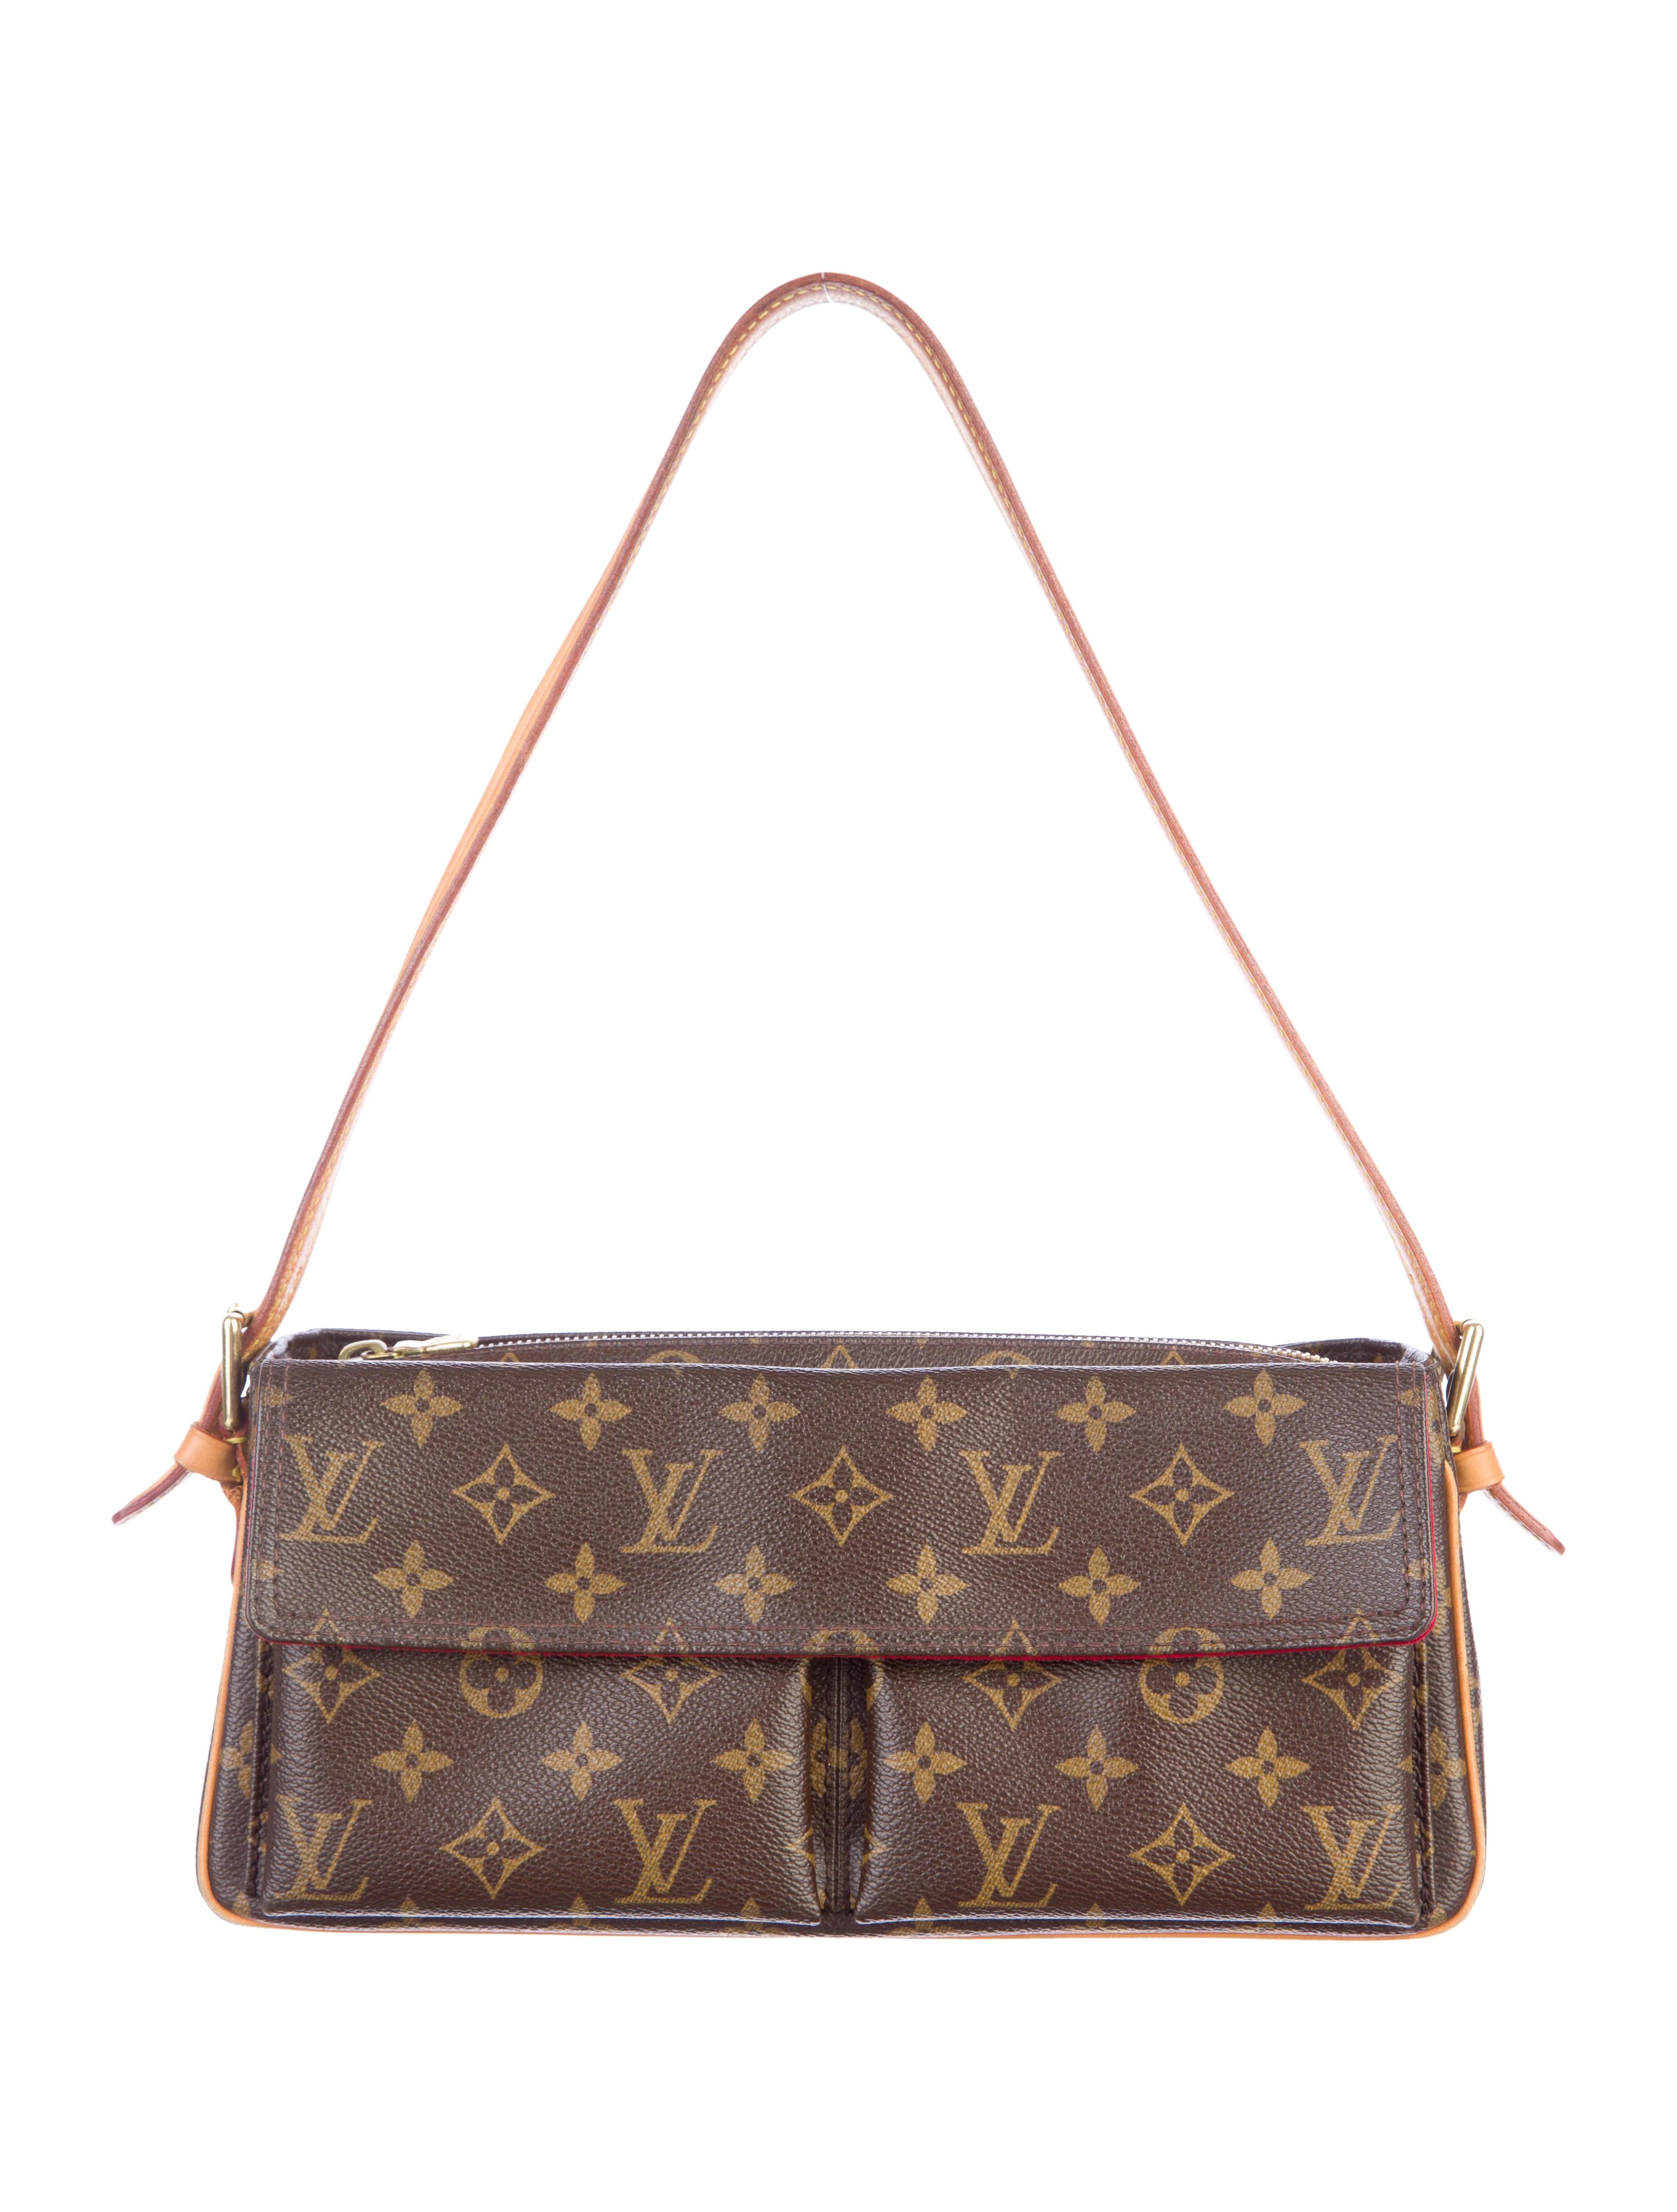 e482079ff7ec0 Louis Vuitton Monogram Viva Cite MM - Handbags - LOU36476